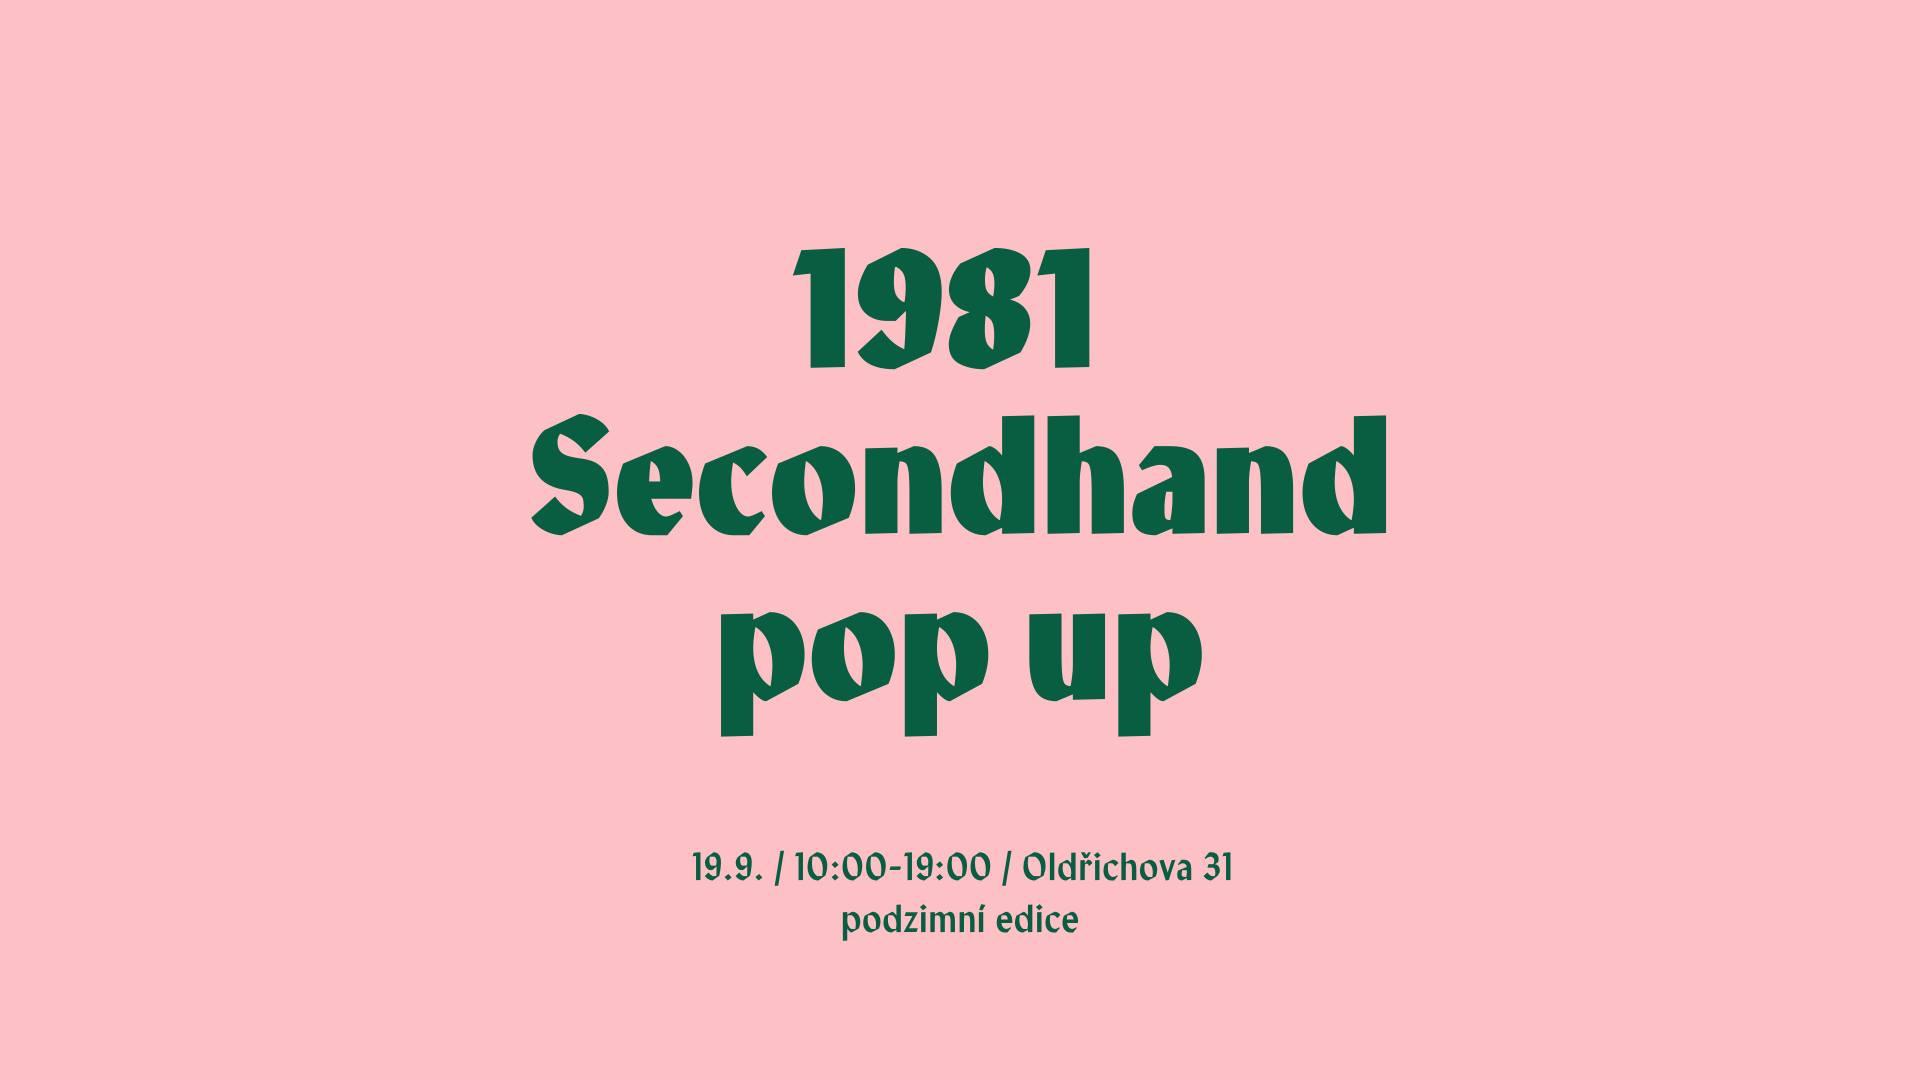 1981 pop up